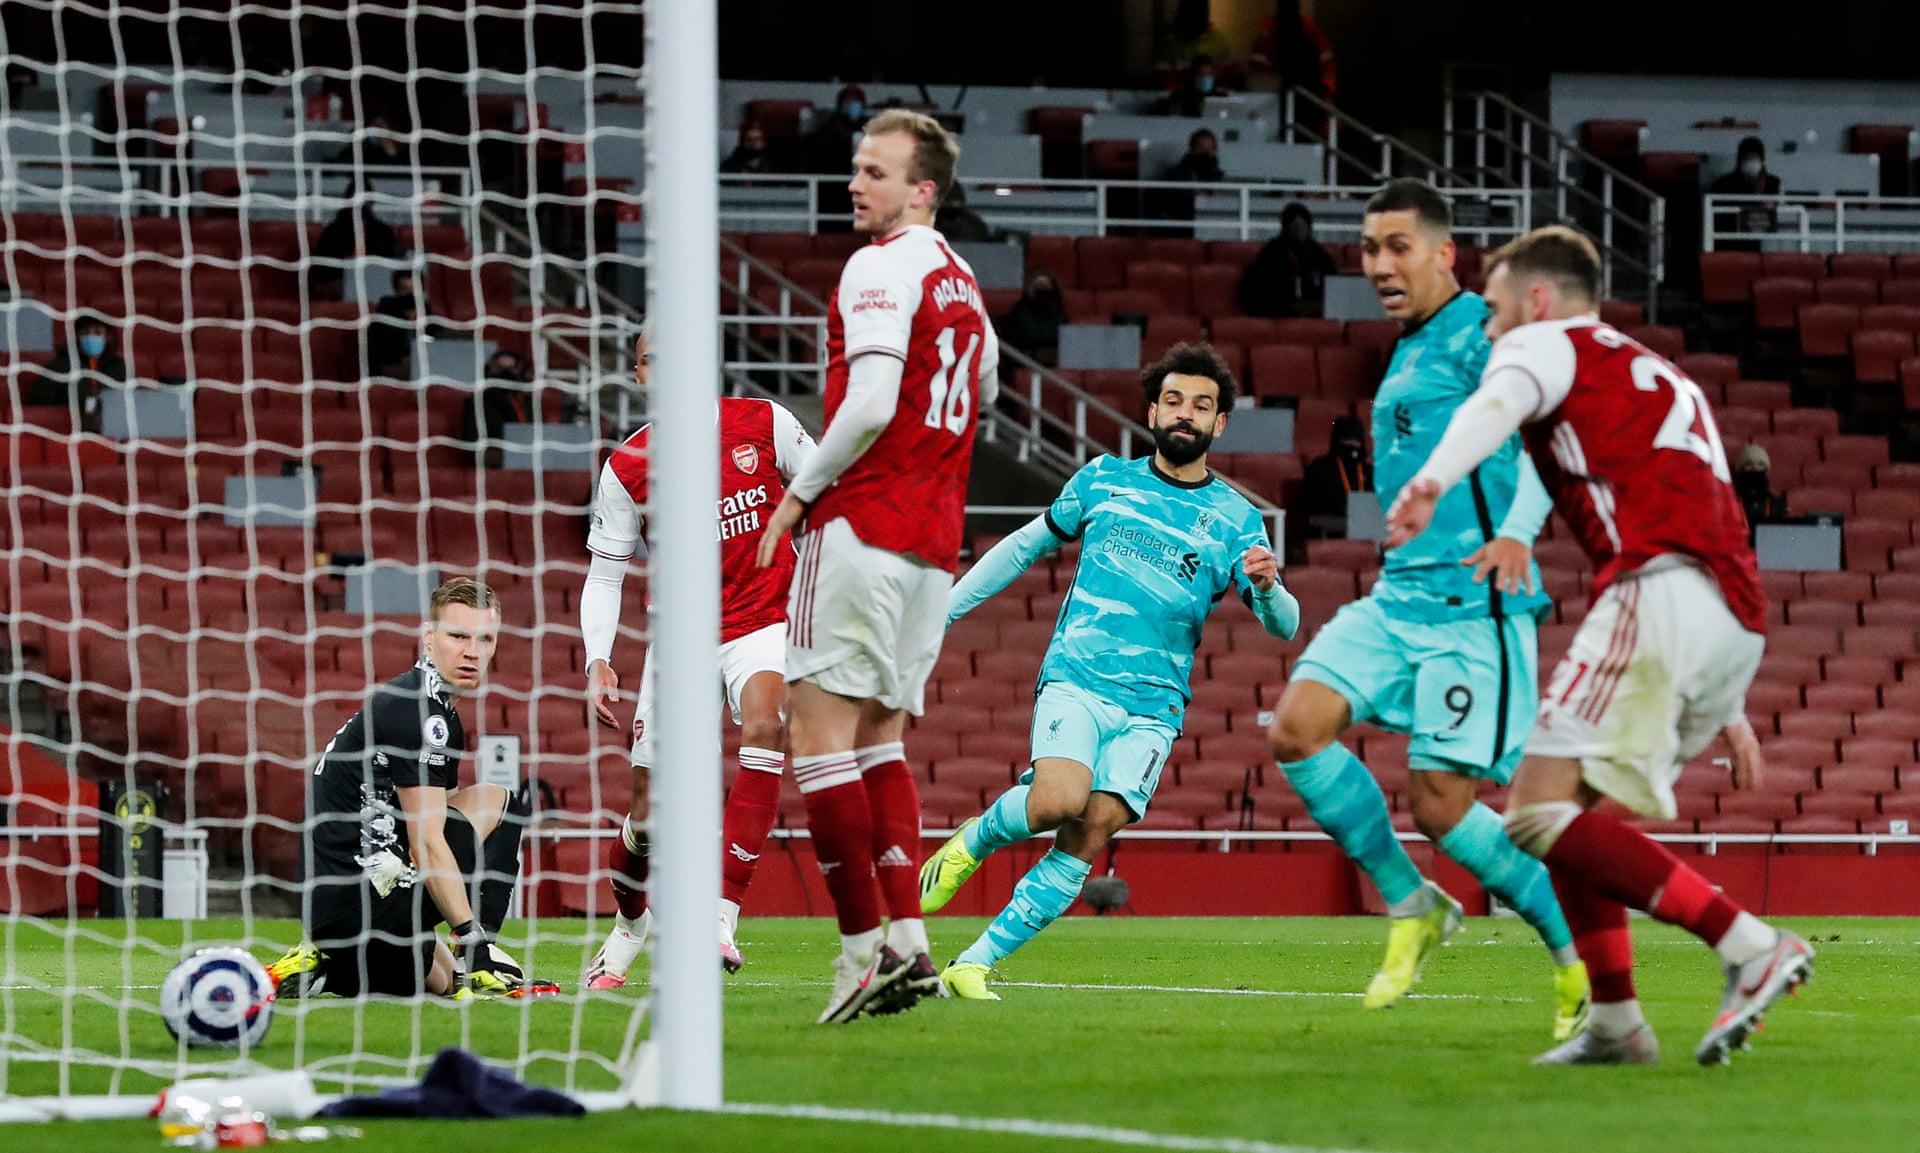 Salah menambah skor menjadi 2-0 dengan umpan silang berbahaya di menit 68. Foto: The Observer